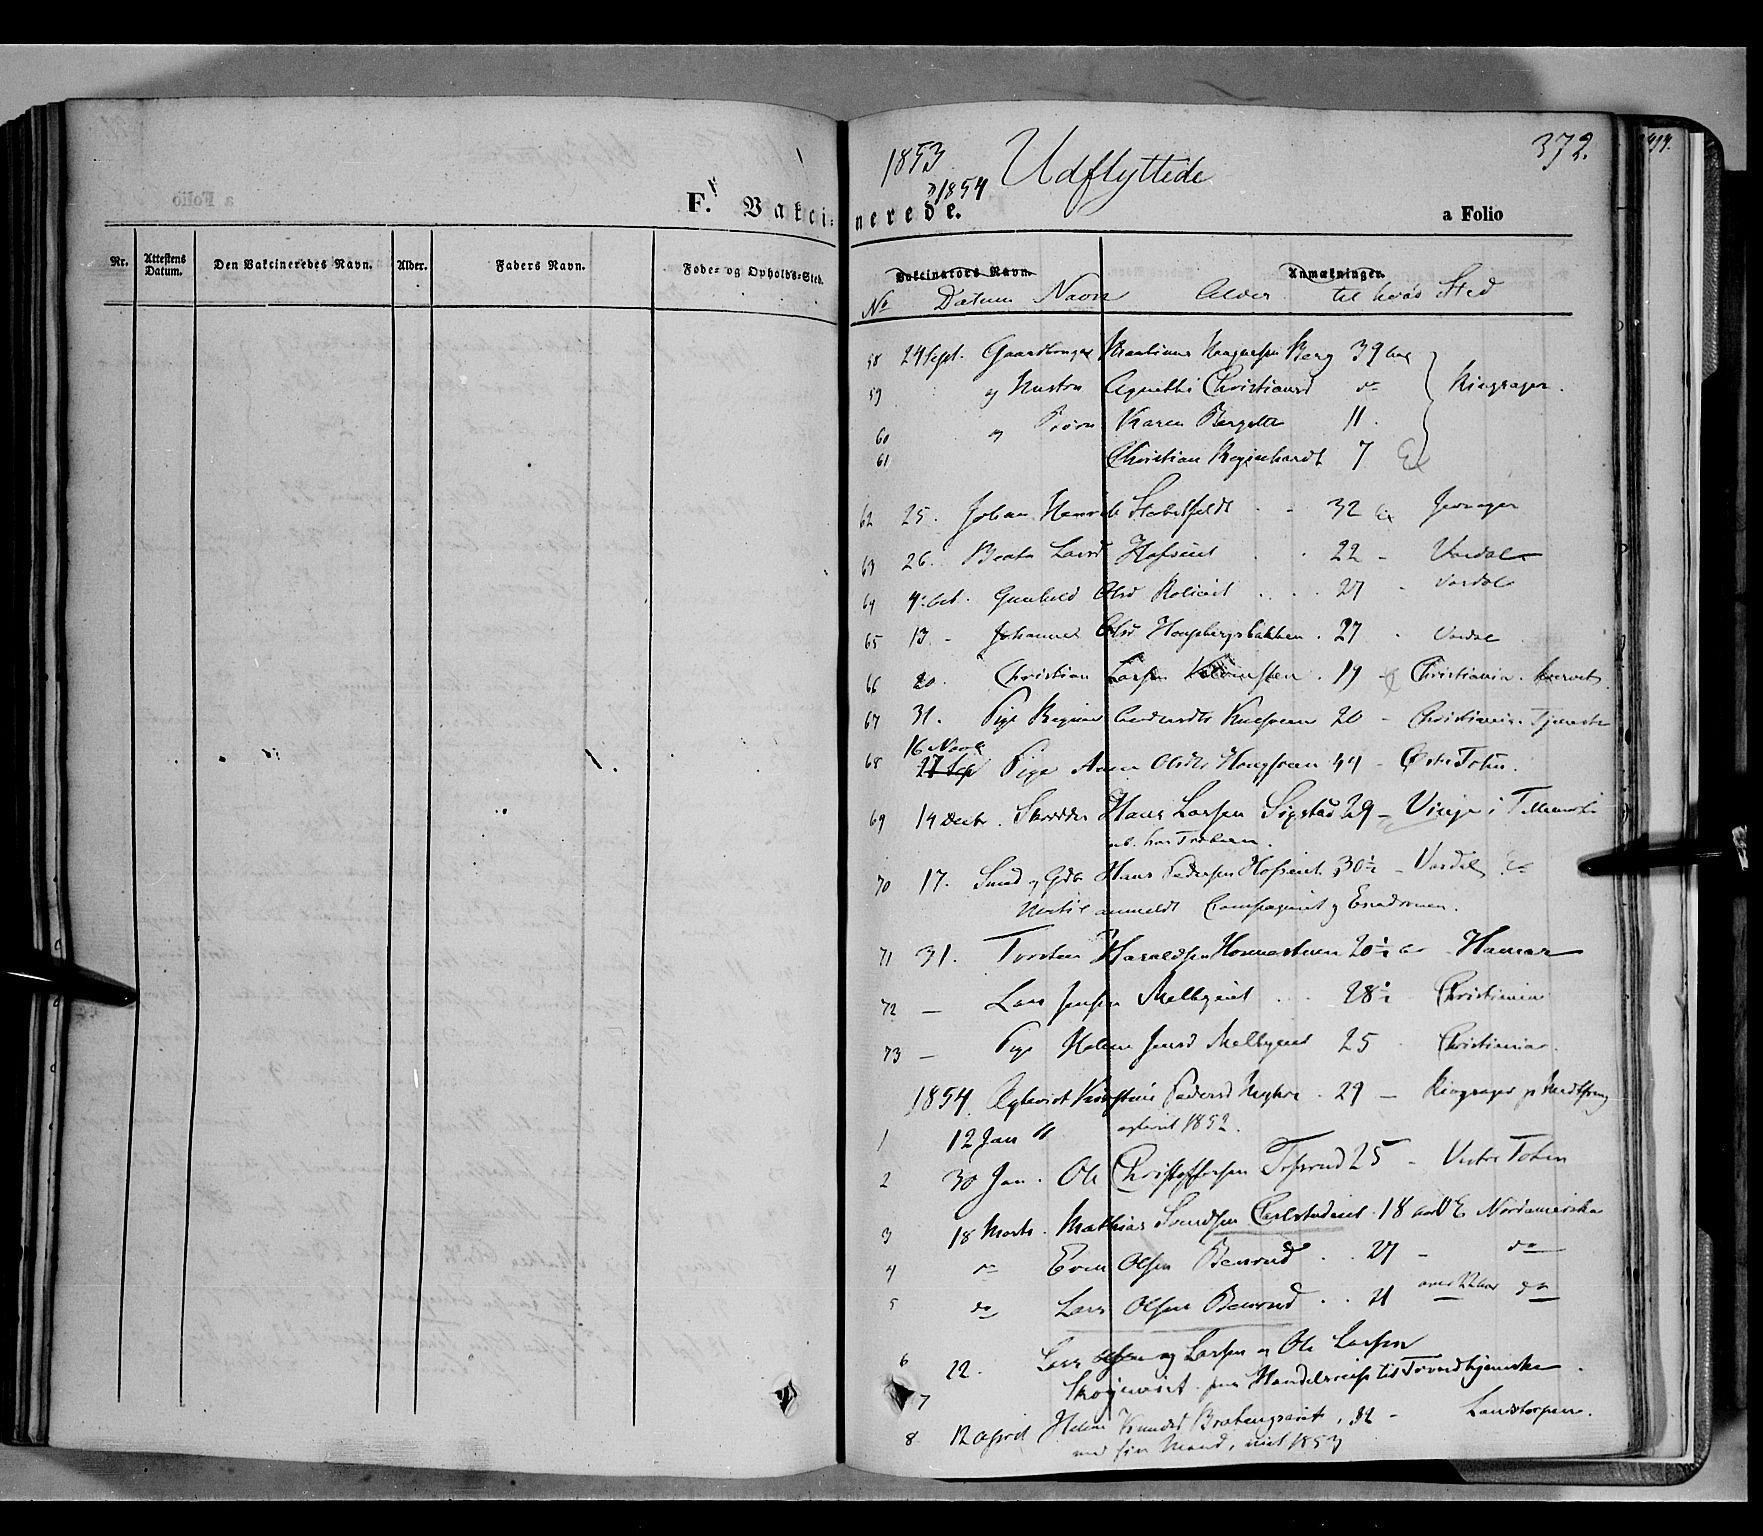 SAH, Biri prestekontor, Ministerialbok nr. 5, 1843-1854, s. 372